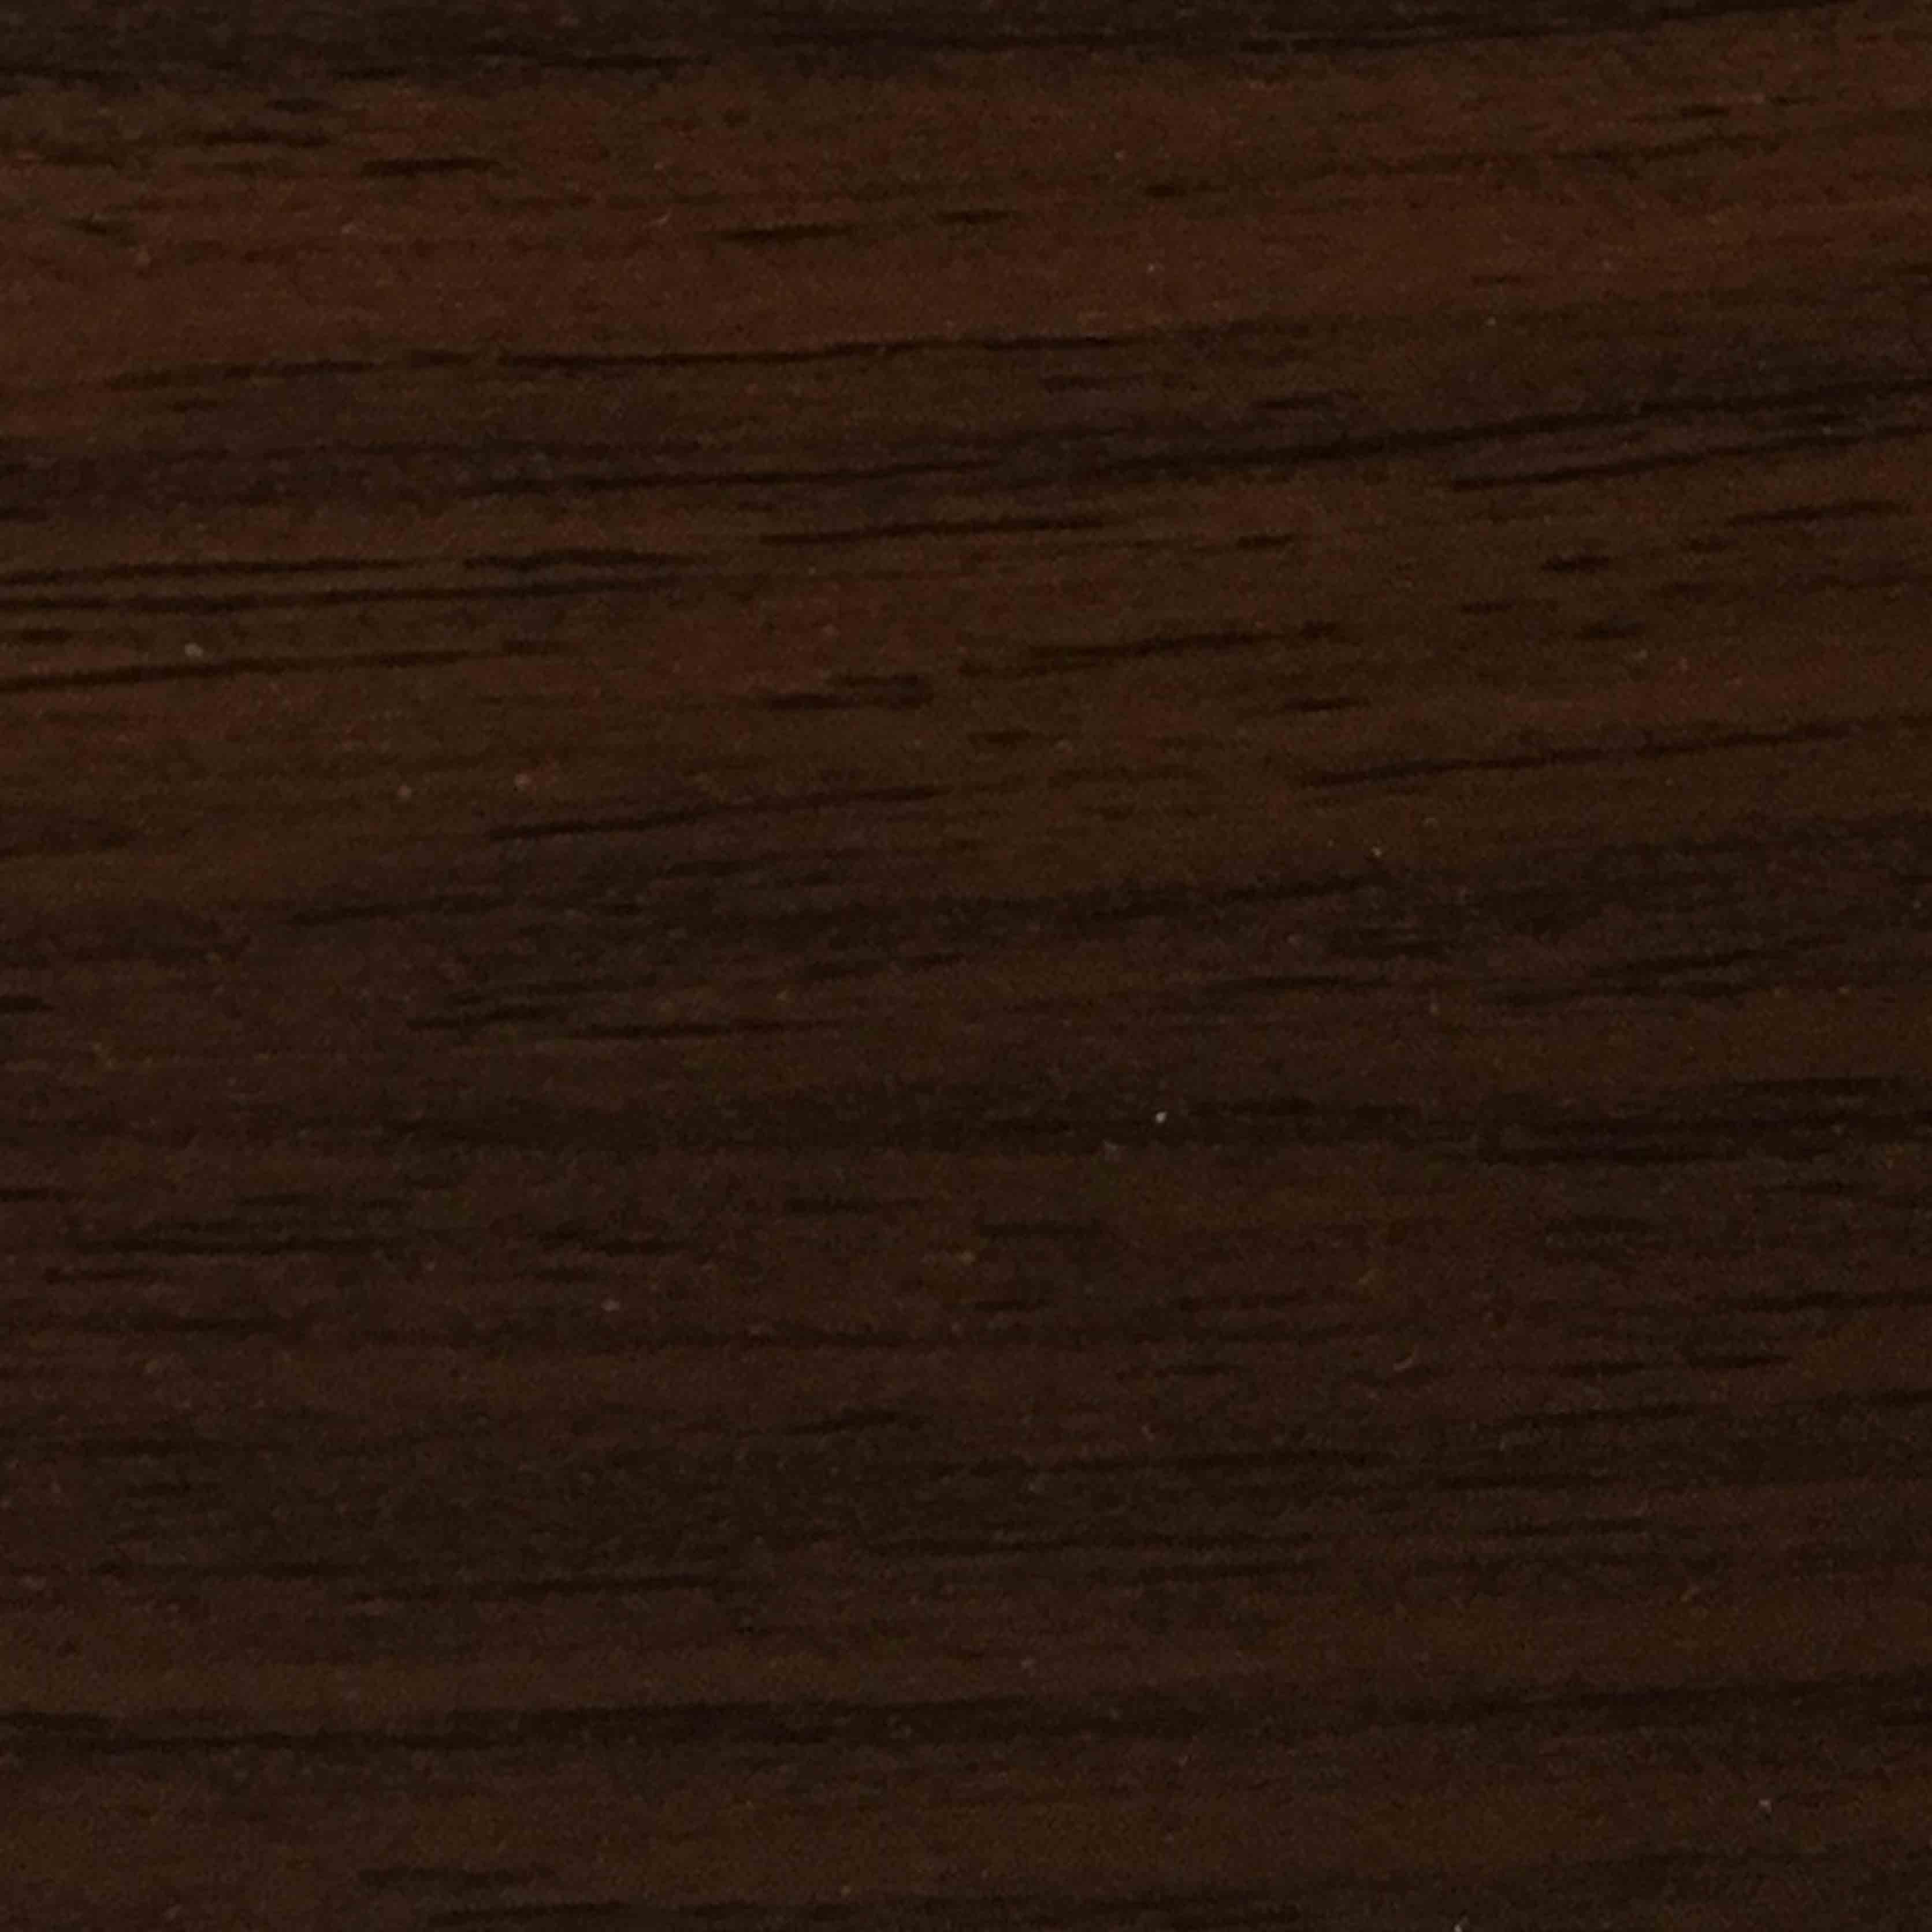 Decal vân gỗ - 3572